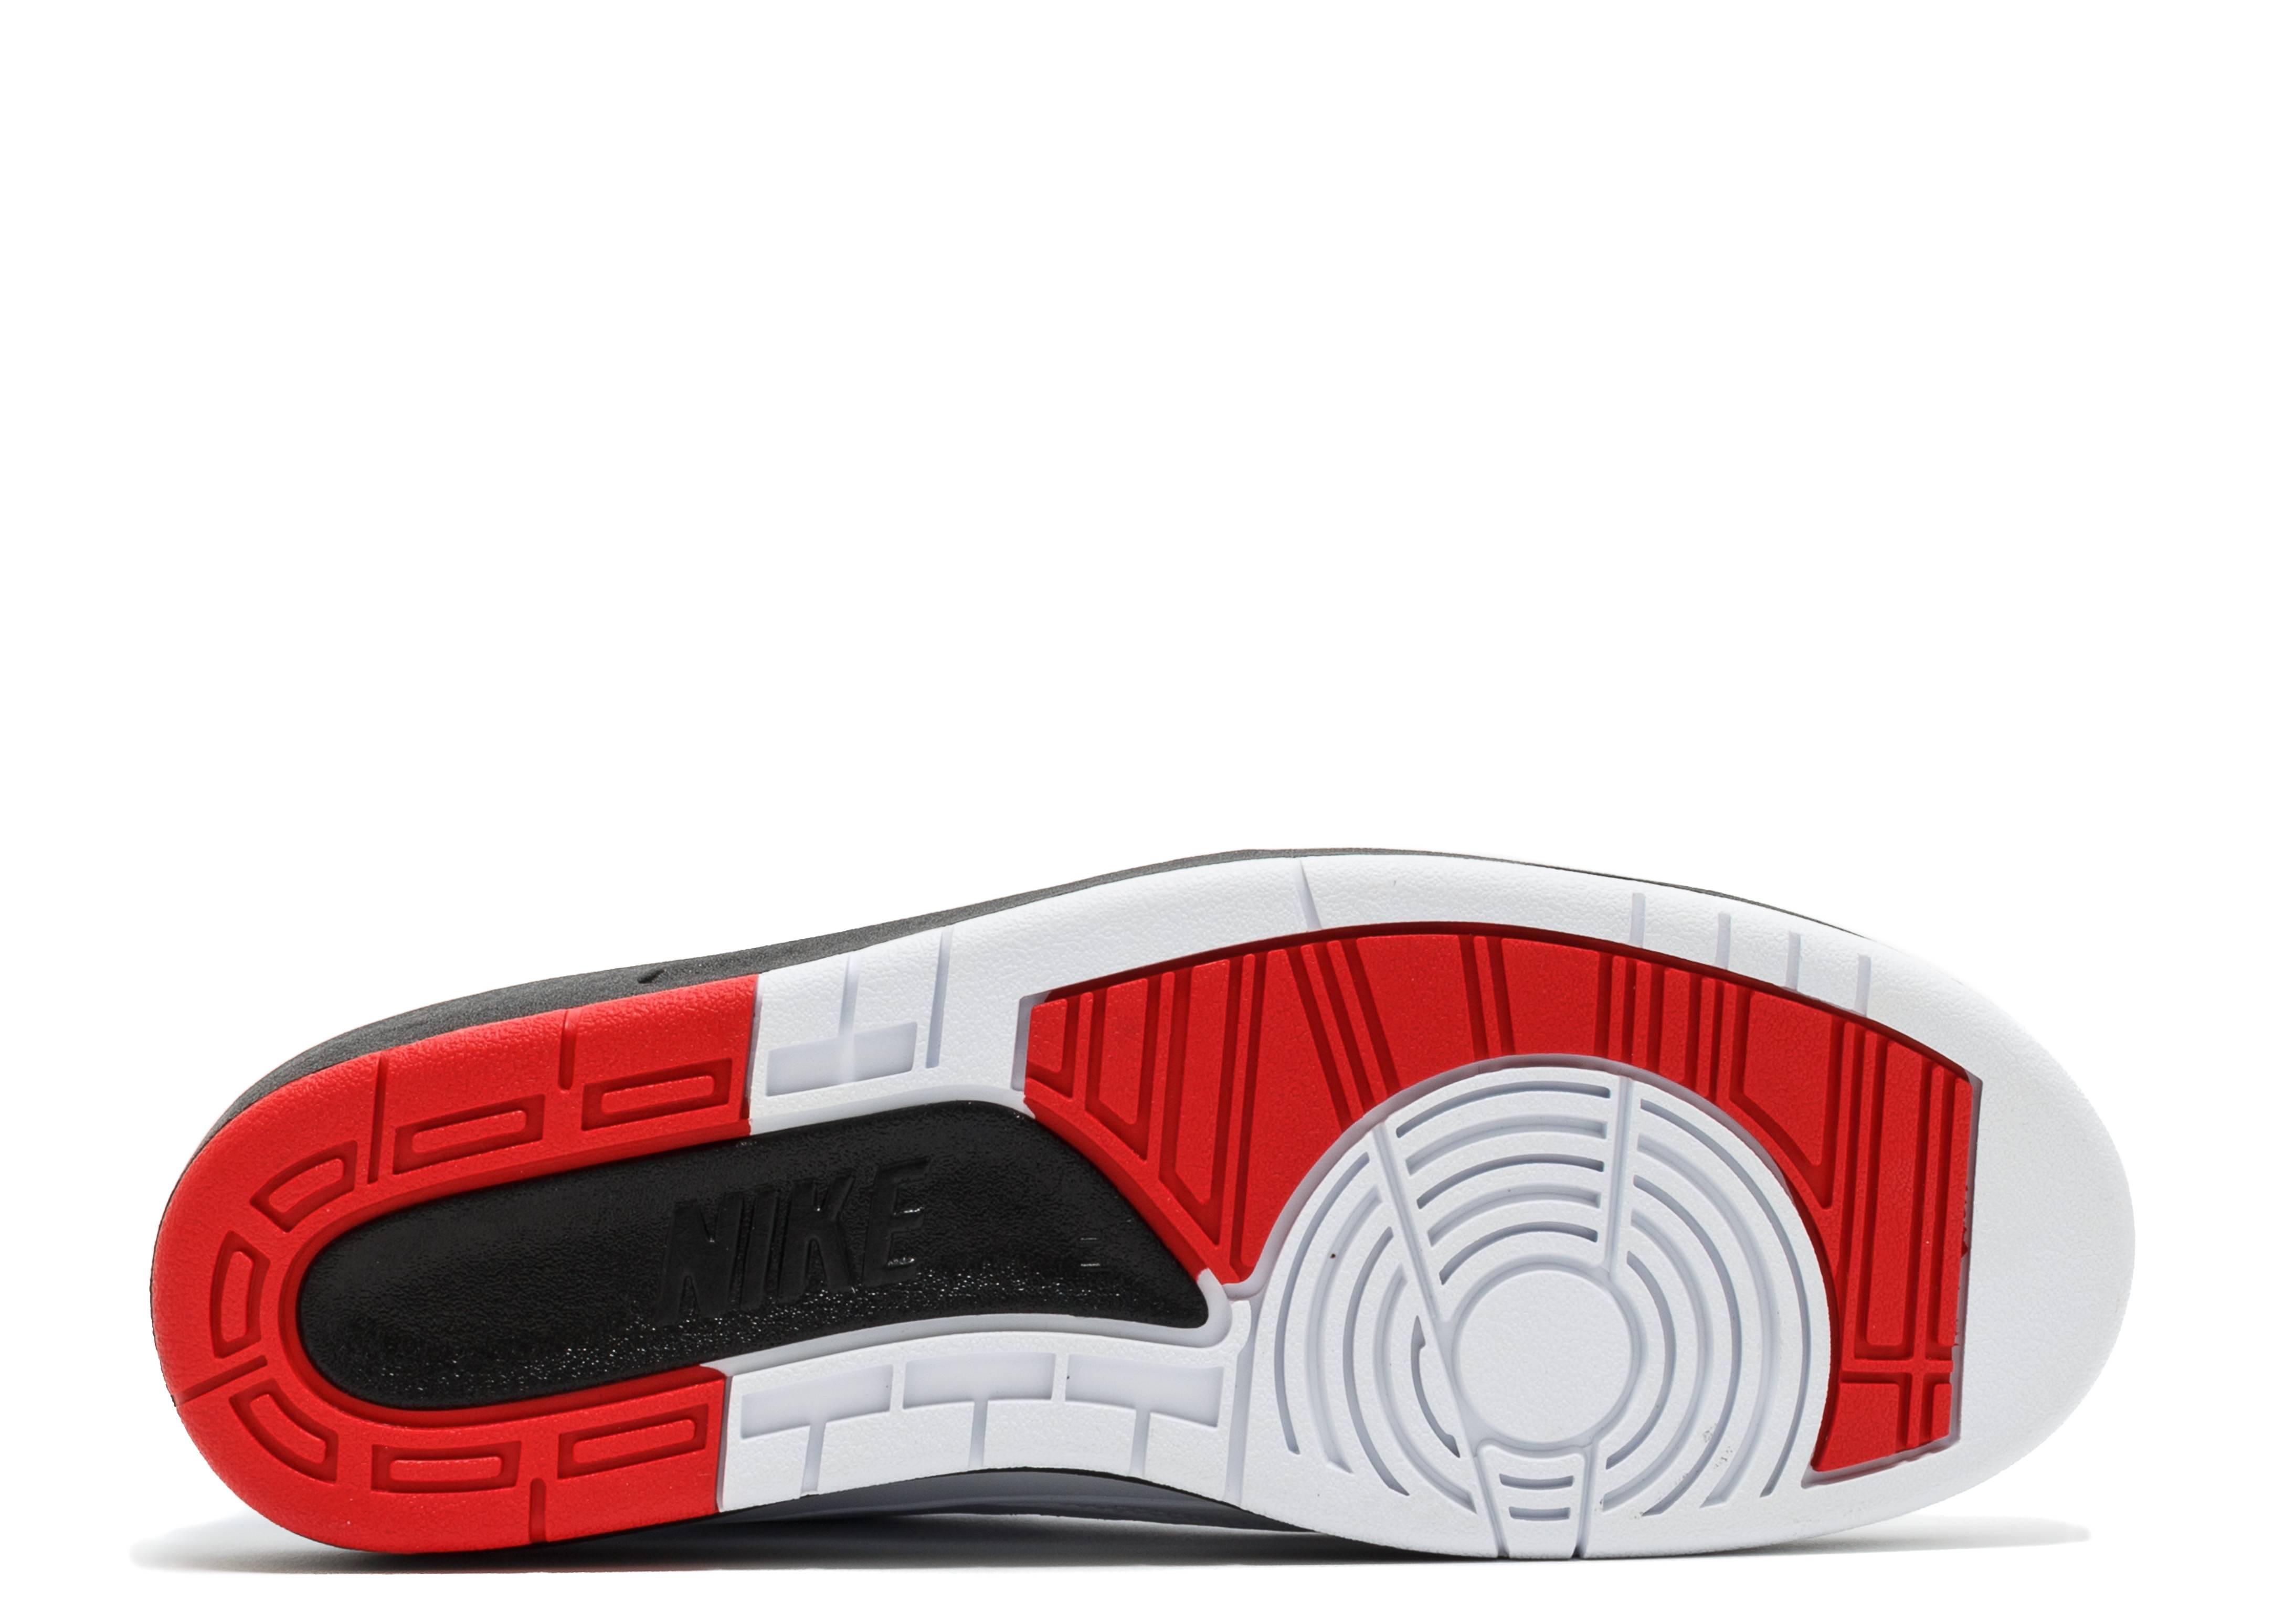 66bef5f9905811 Jordan X Converse Pack - Nike - 917931 900 - multi-color multi-color ...